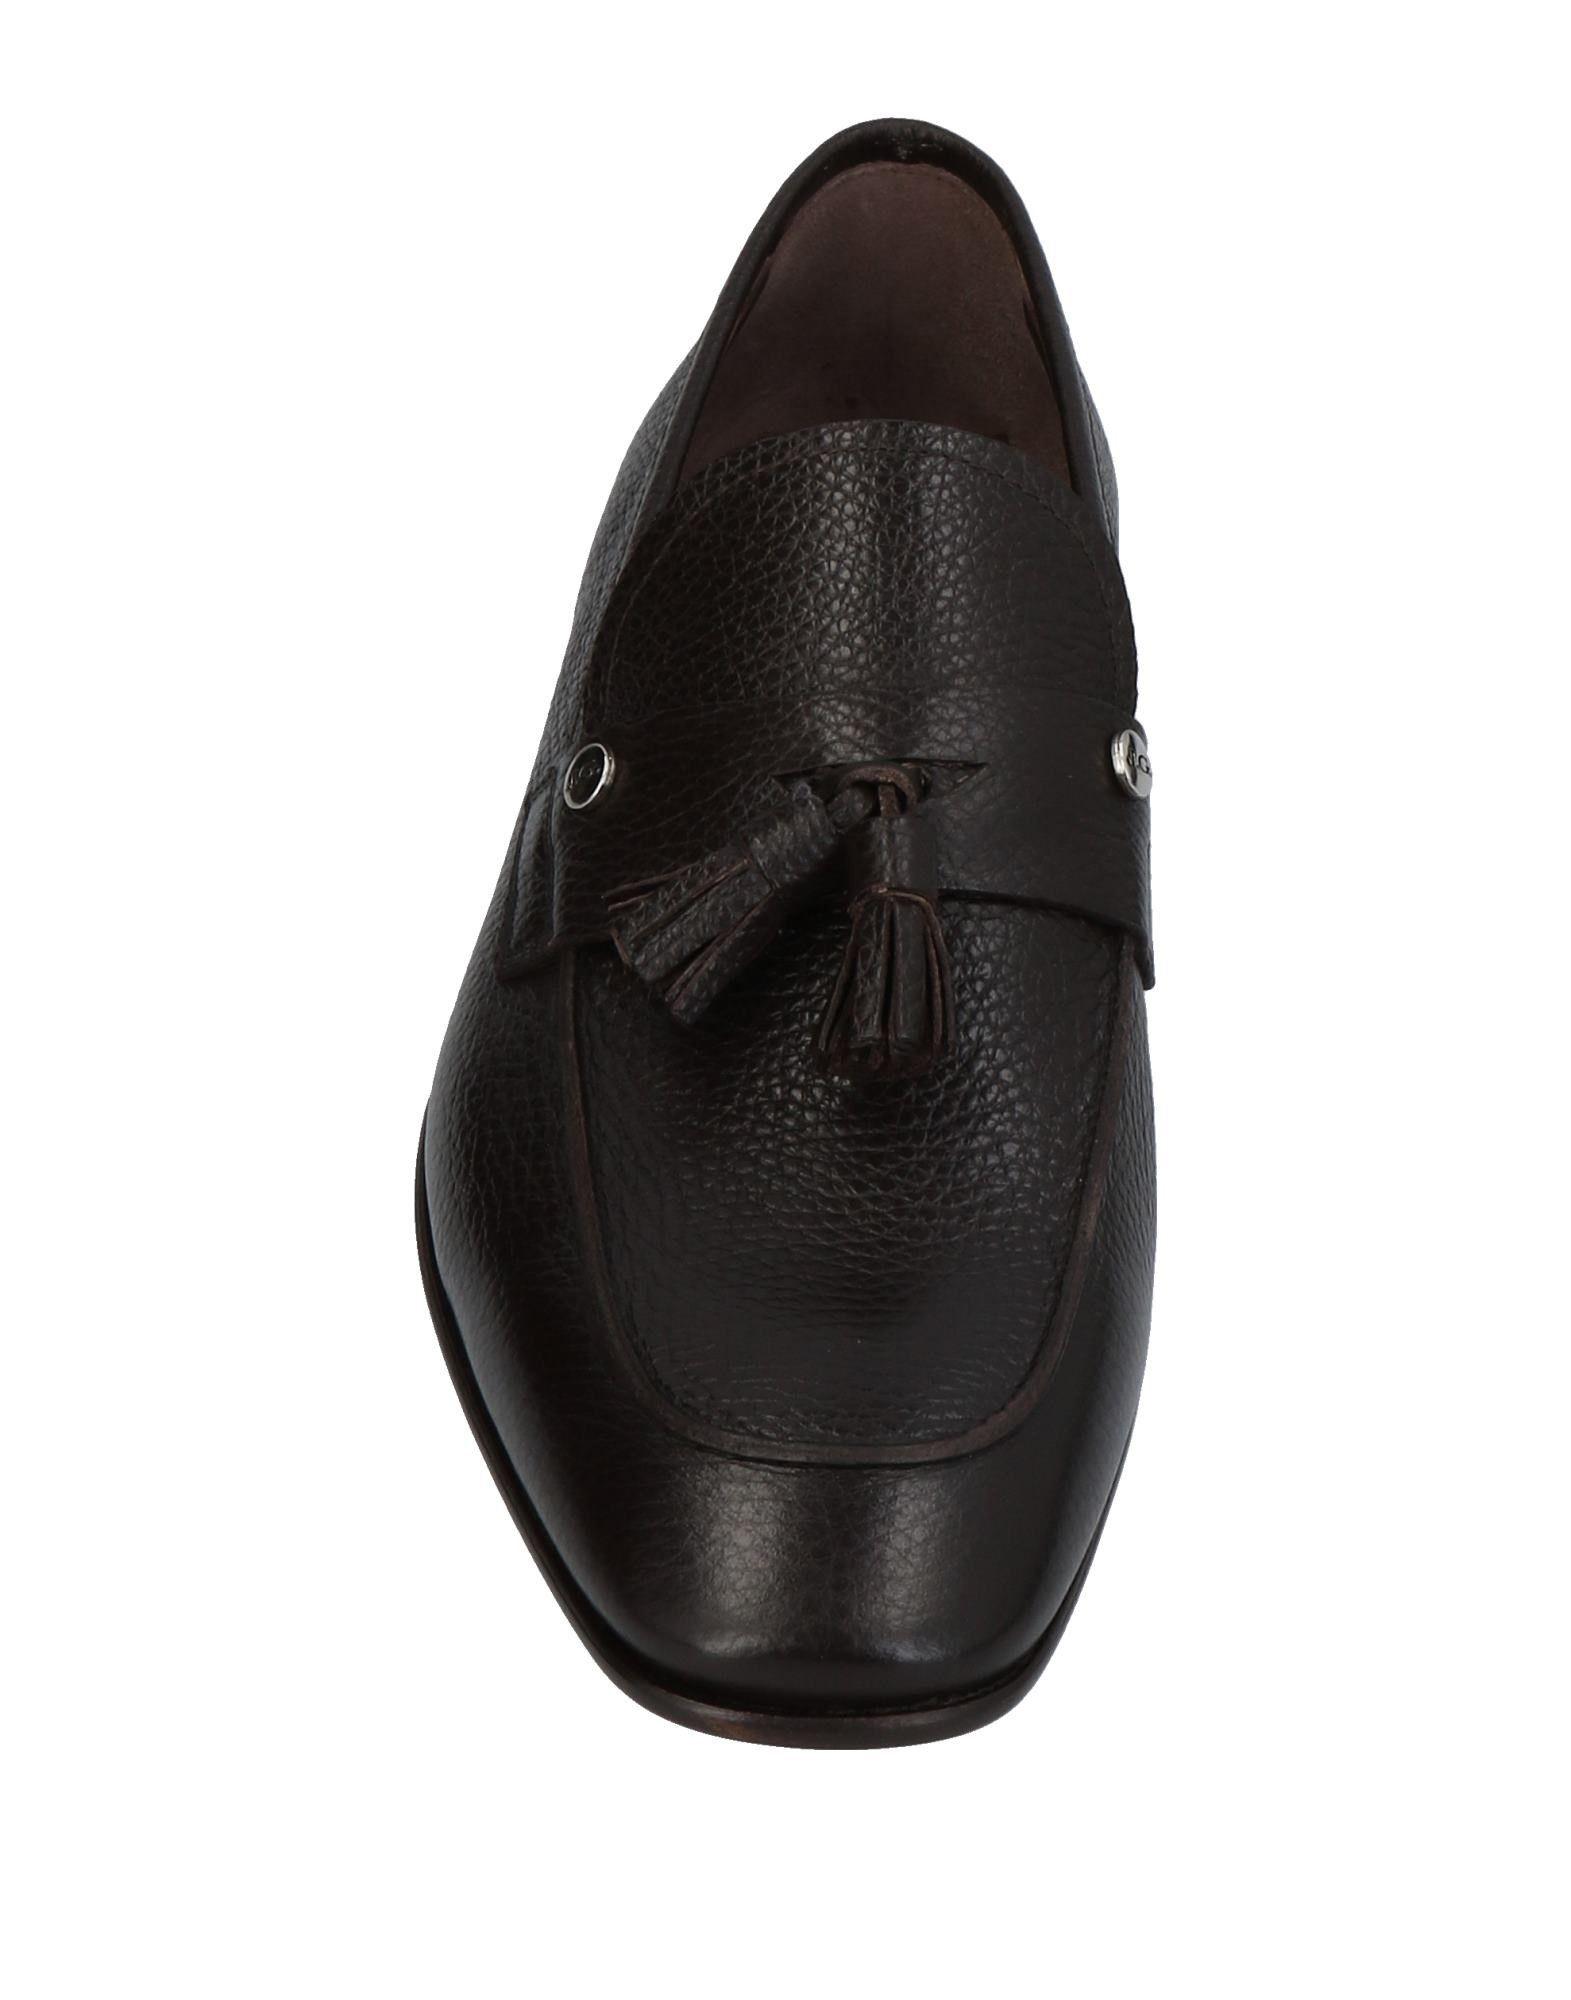 John Galliano Mokassins Herren  11426124ML Gute Qualität beliebte Schuhe